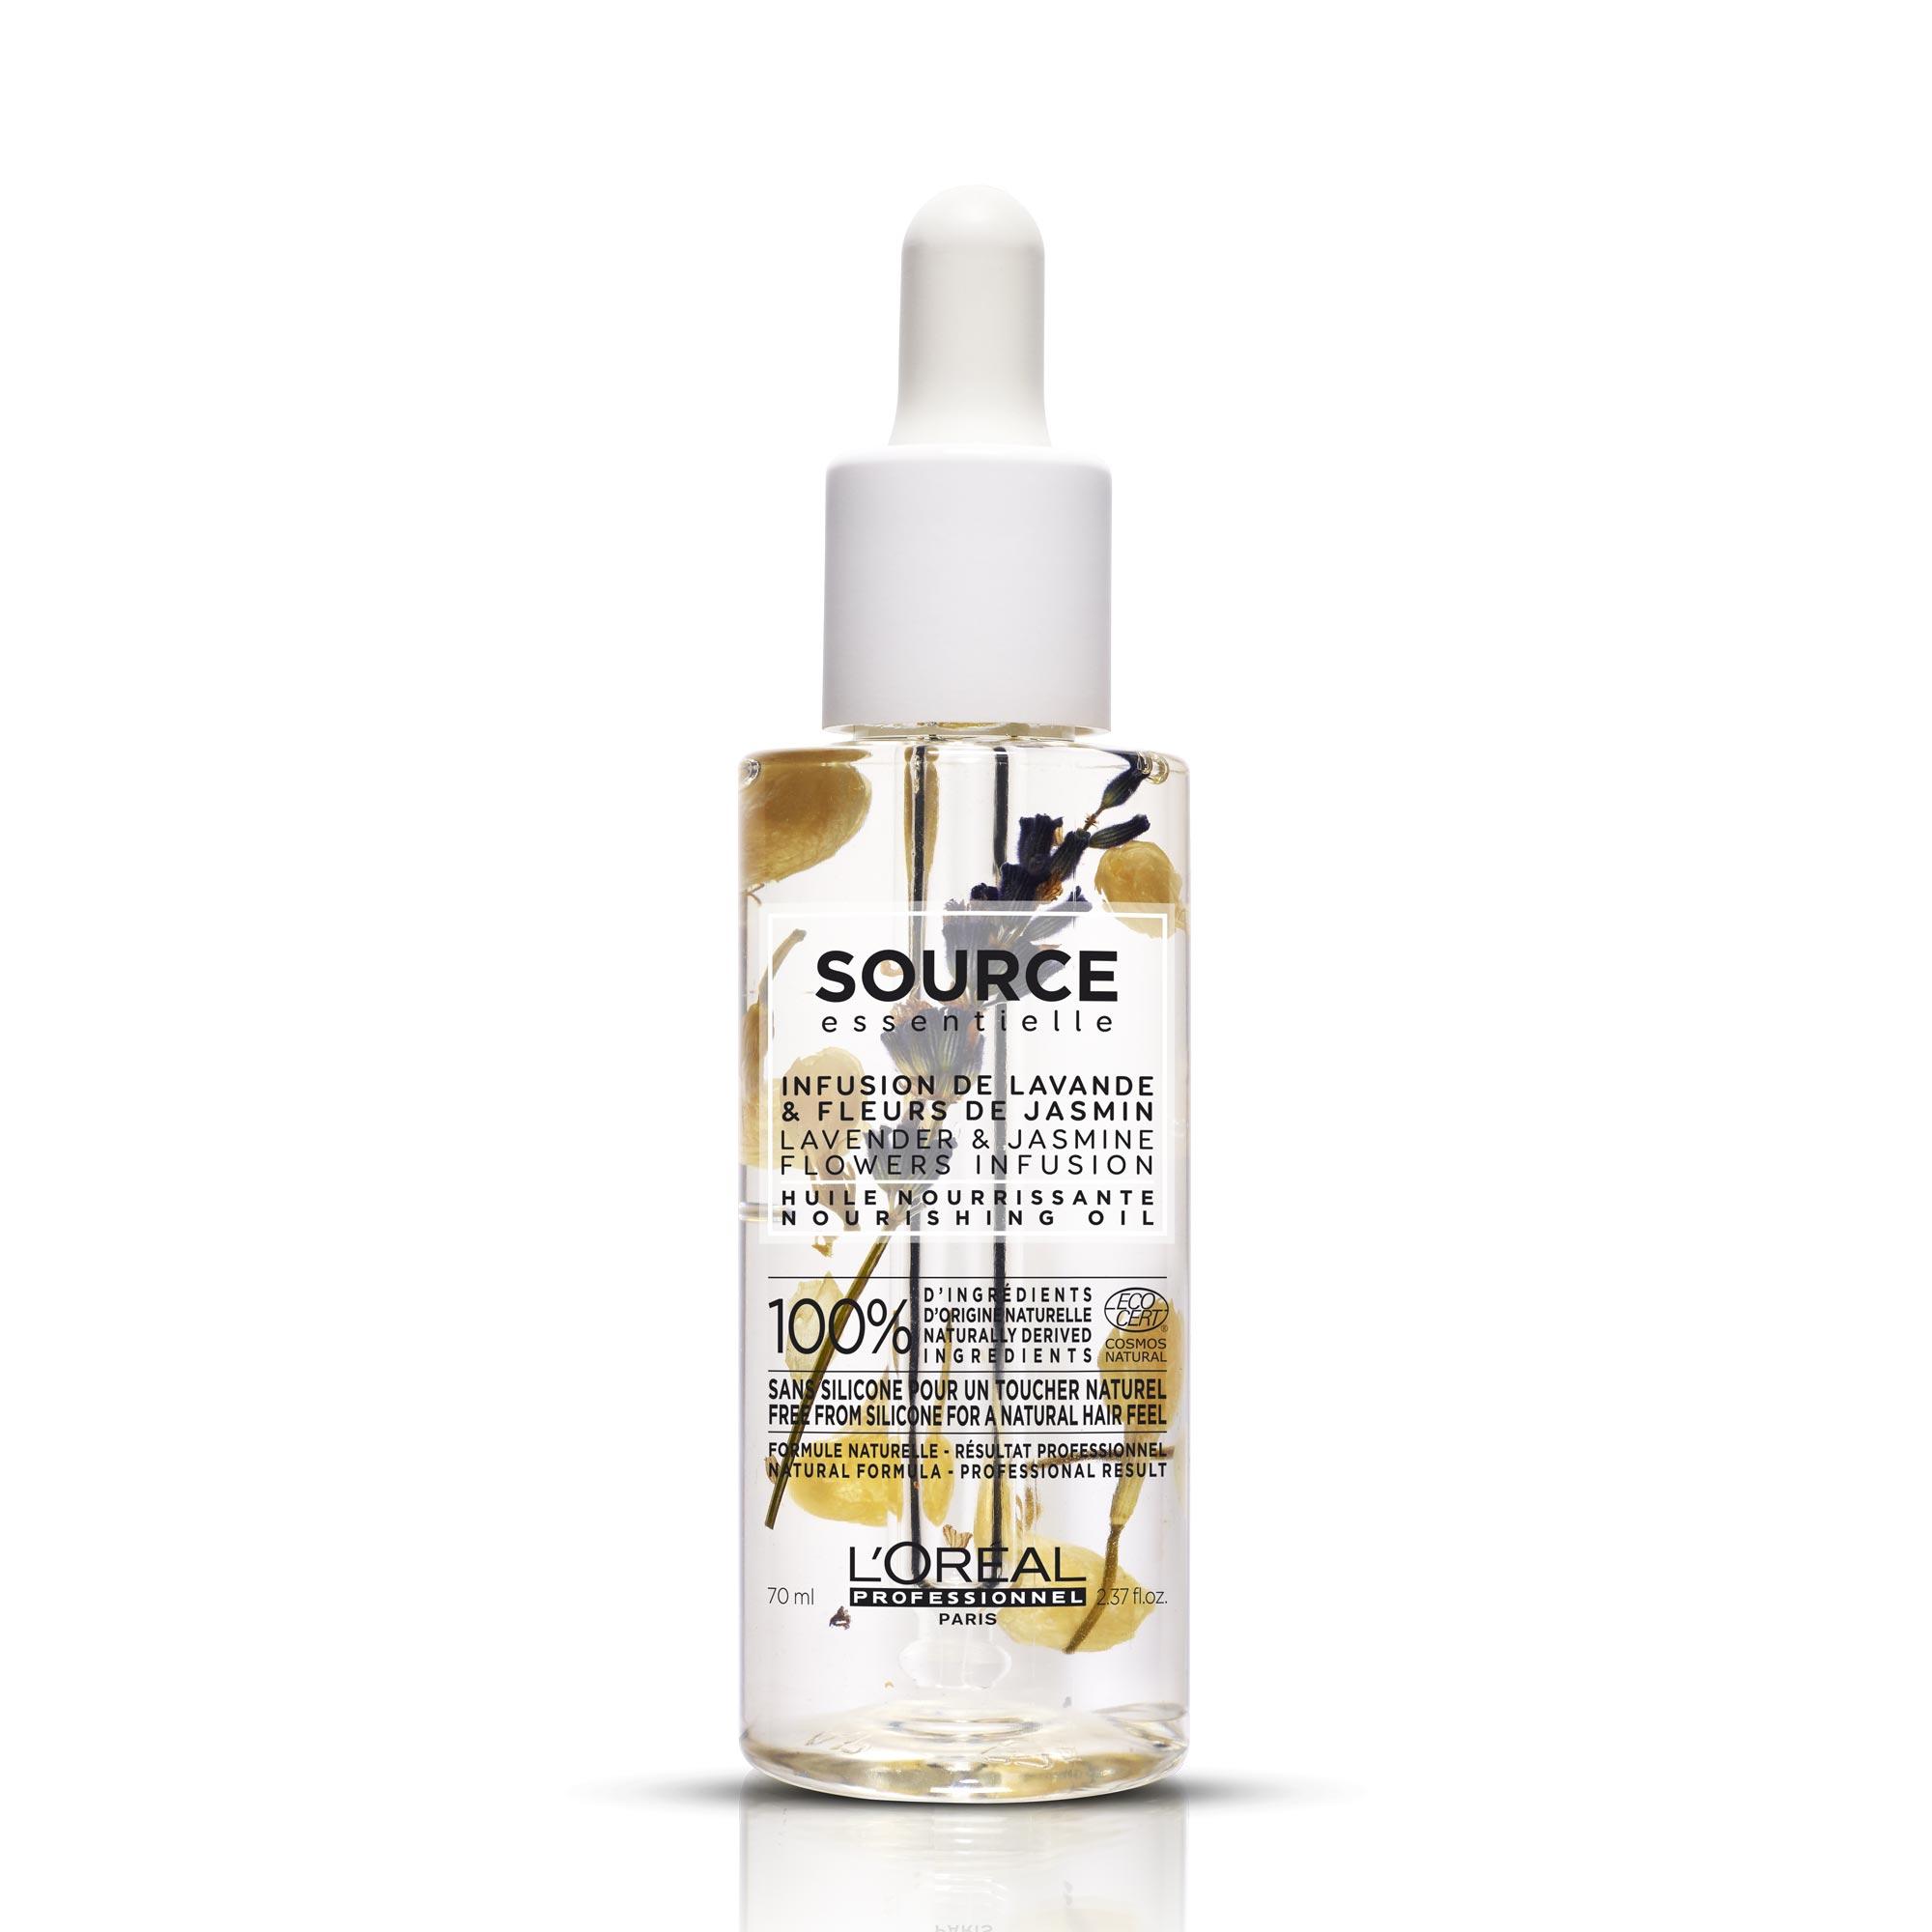 Source Essentielle Nourishing Oil 75ml